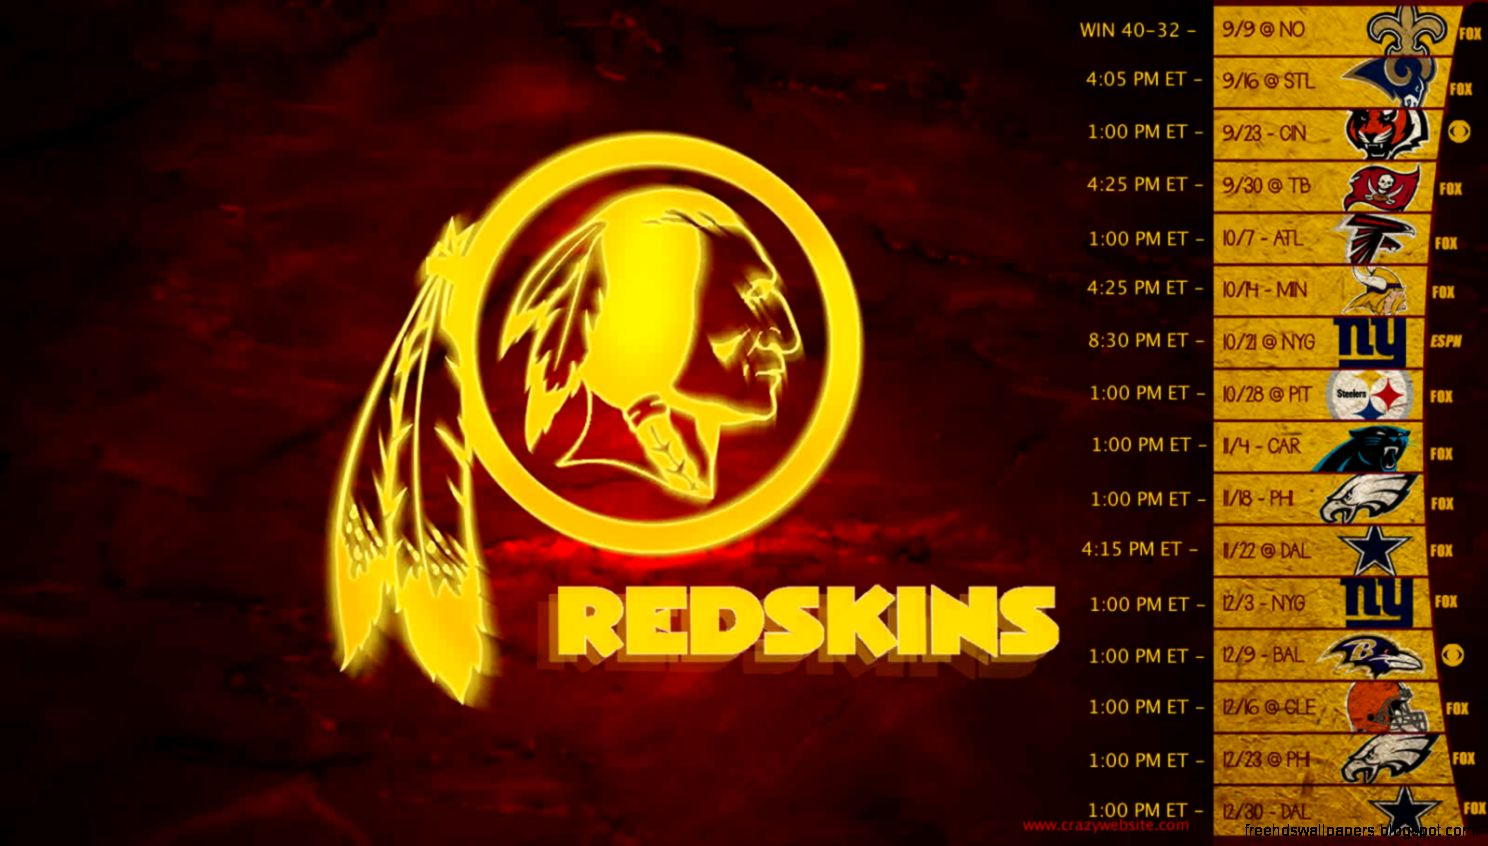 Collection Washington Redskins Wallpaper 1 3